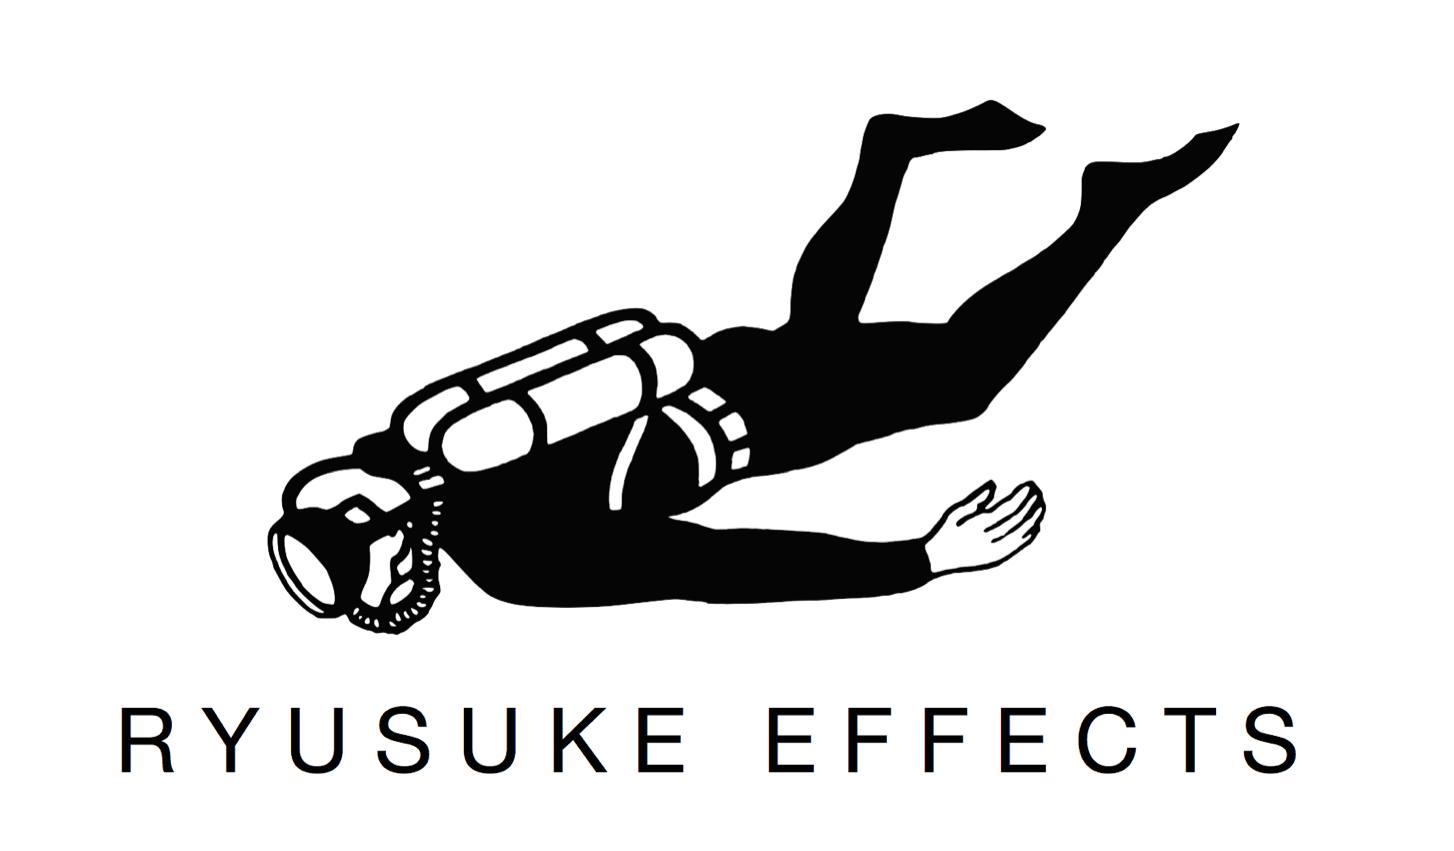 Ryusuke Effects